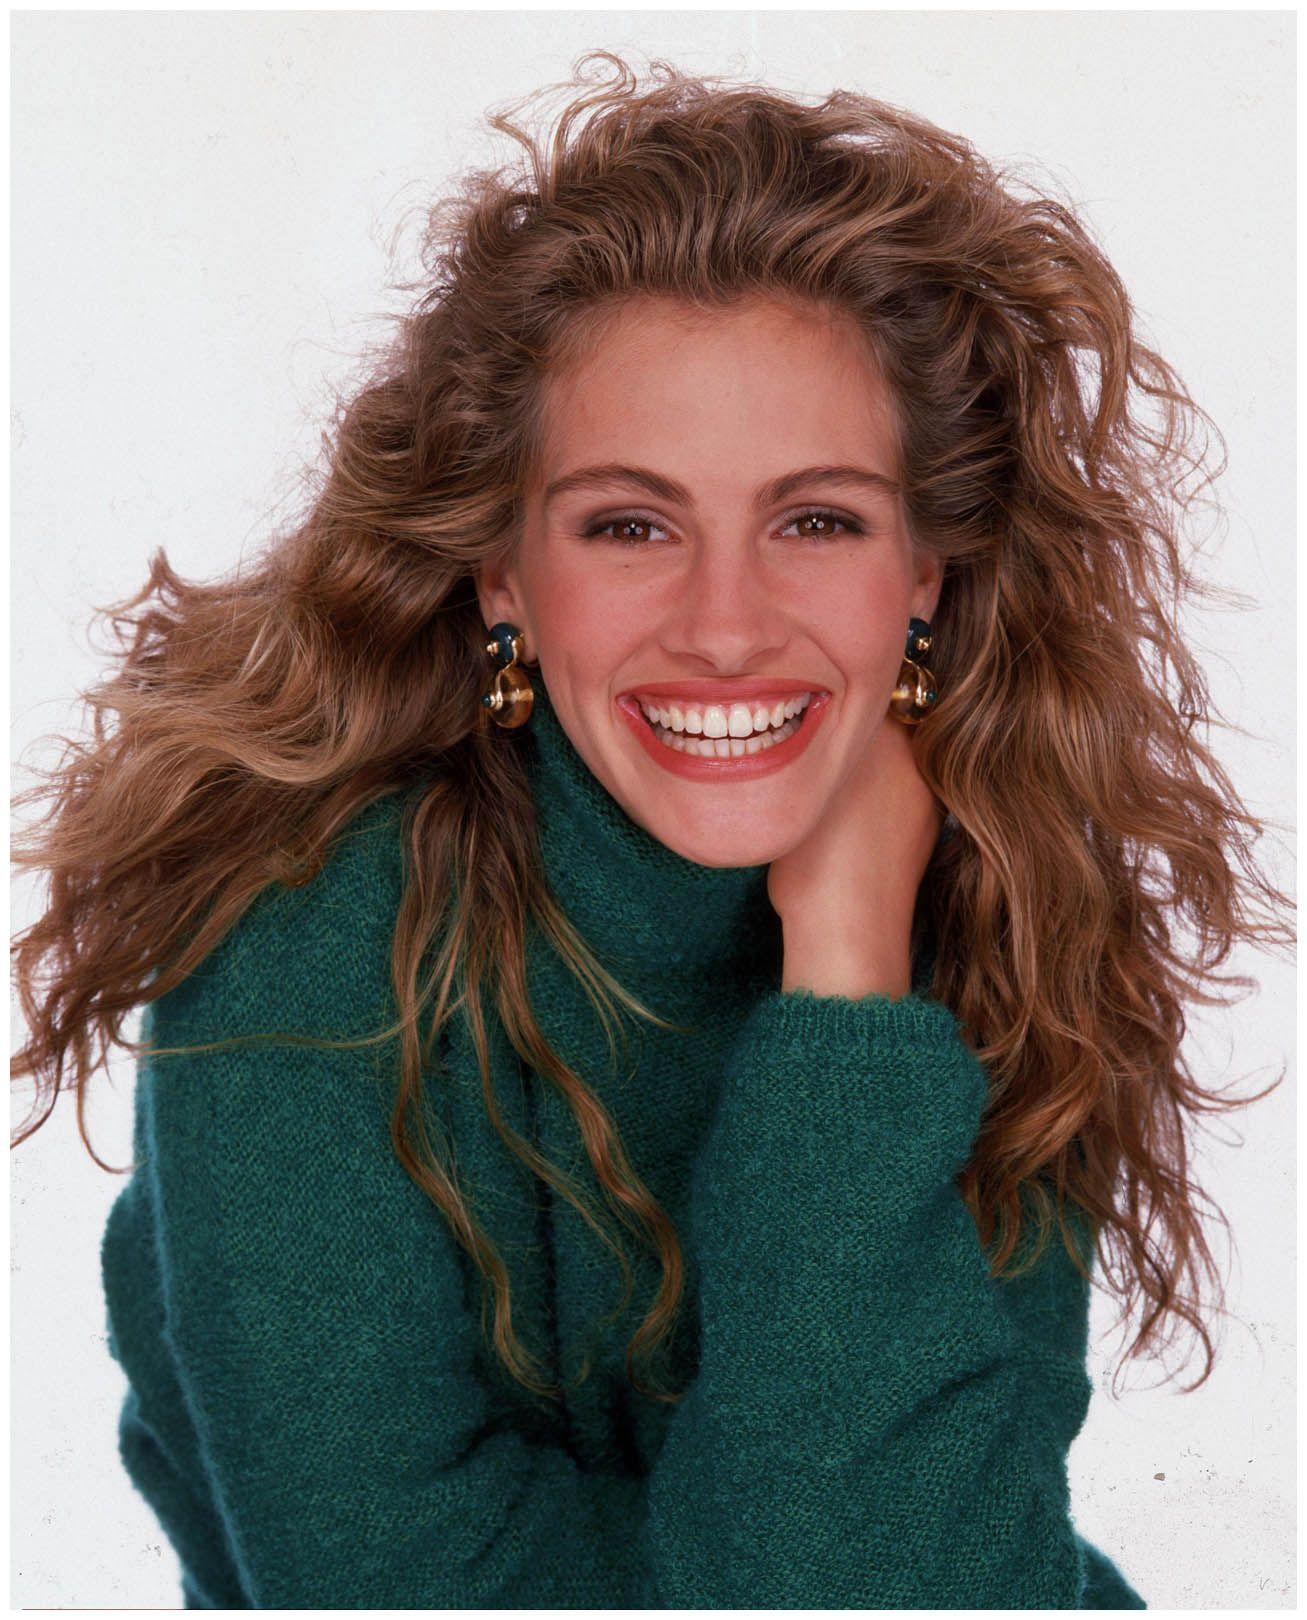 Watch Danielle Castano (b. 1989) video